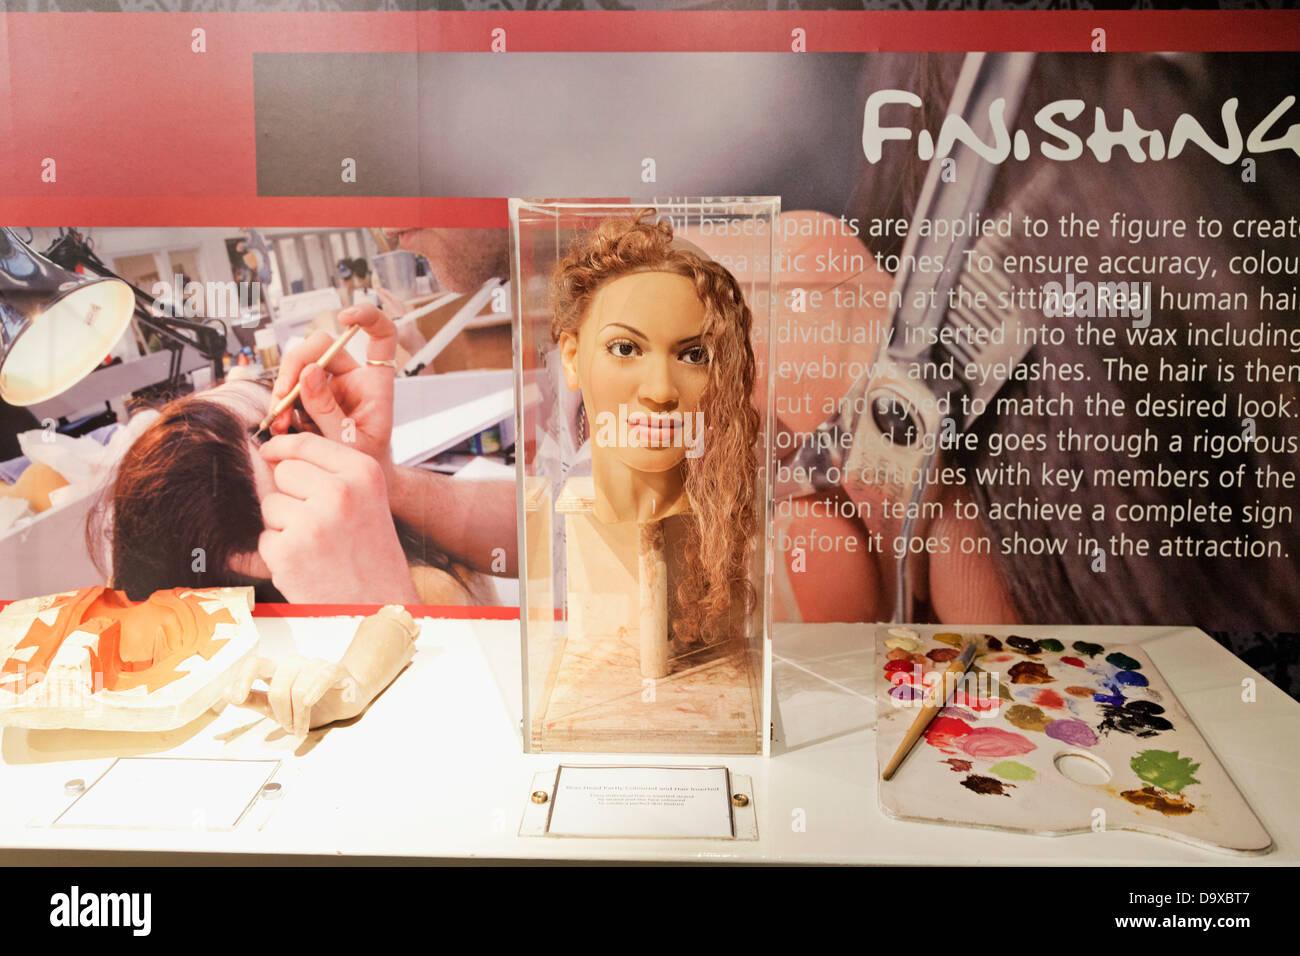 UK, England, London, Madame Tussauds, Exhibit of the Waxwork Making of the Popstar Beyonce's Head - Stock Image